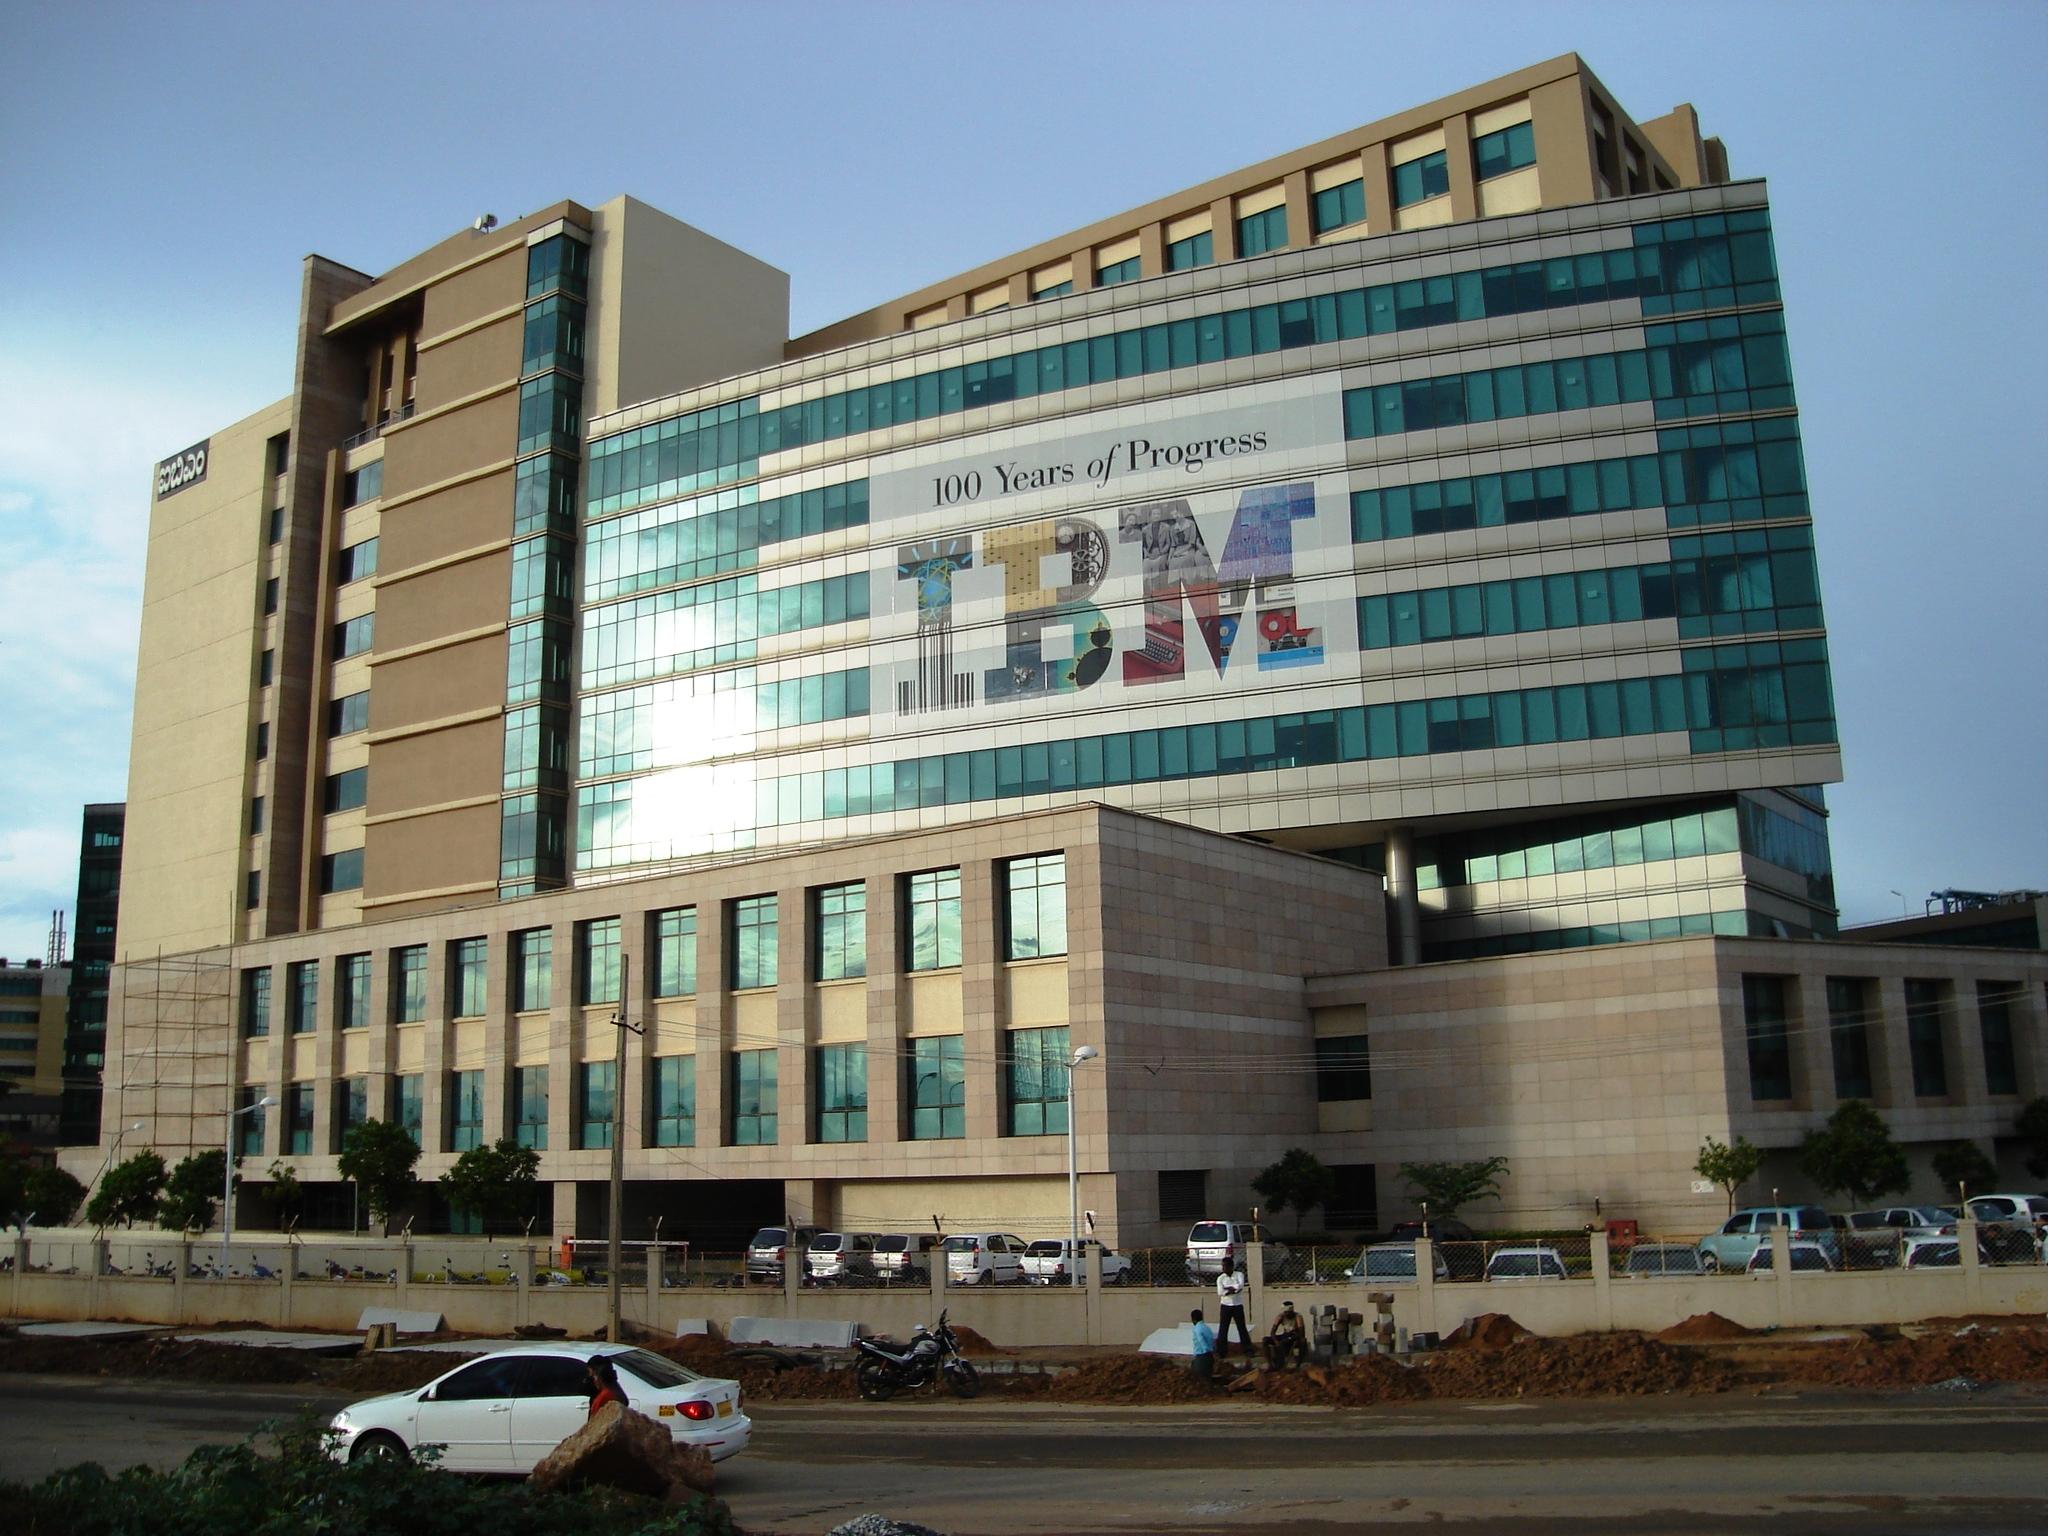 Test Systems Better, IBM tells UK IT meltdown bank TSB | erpinnews